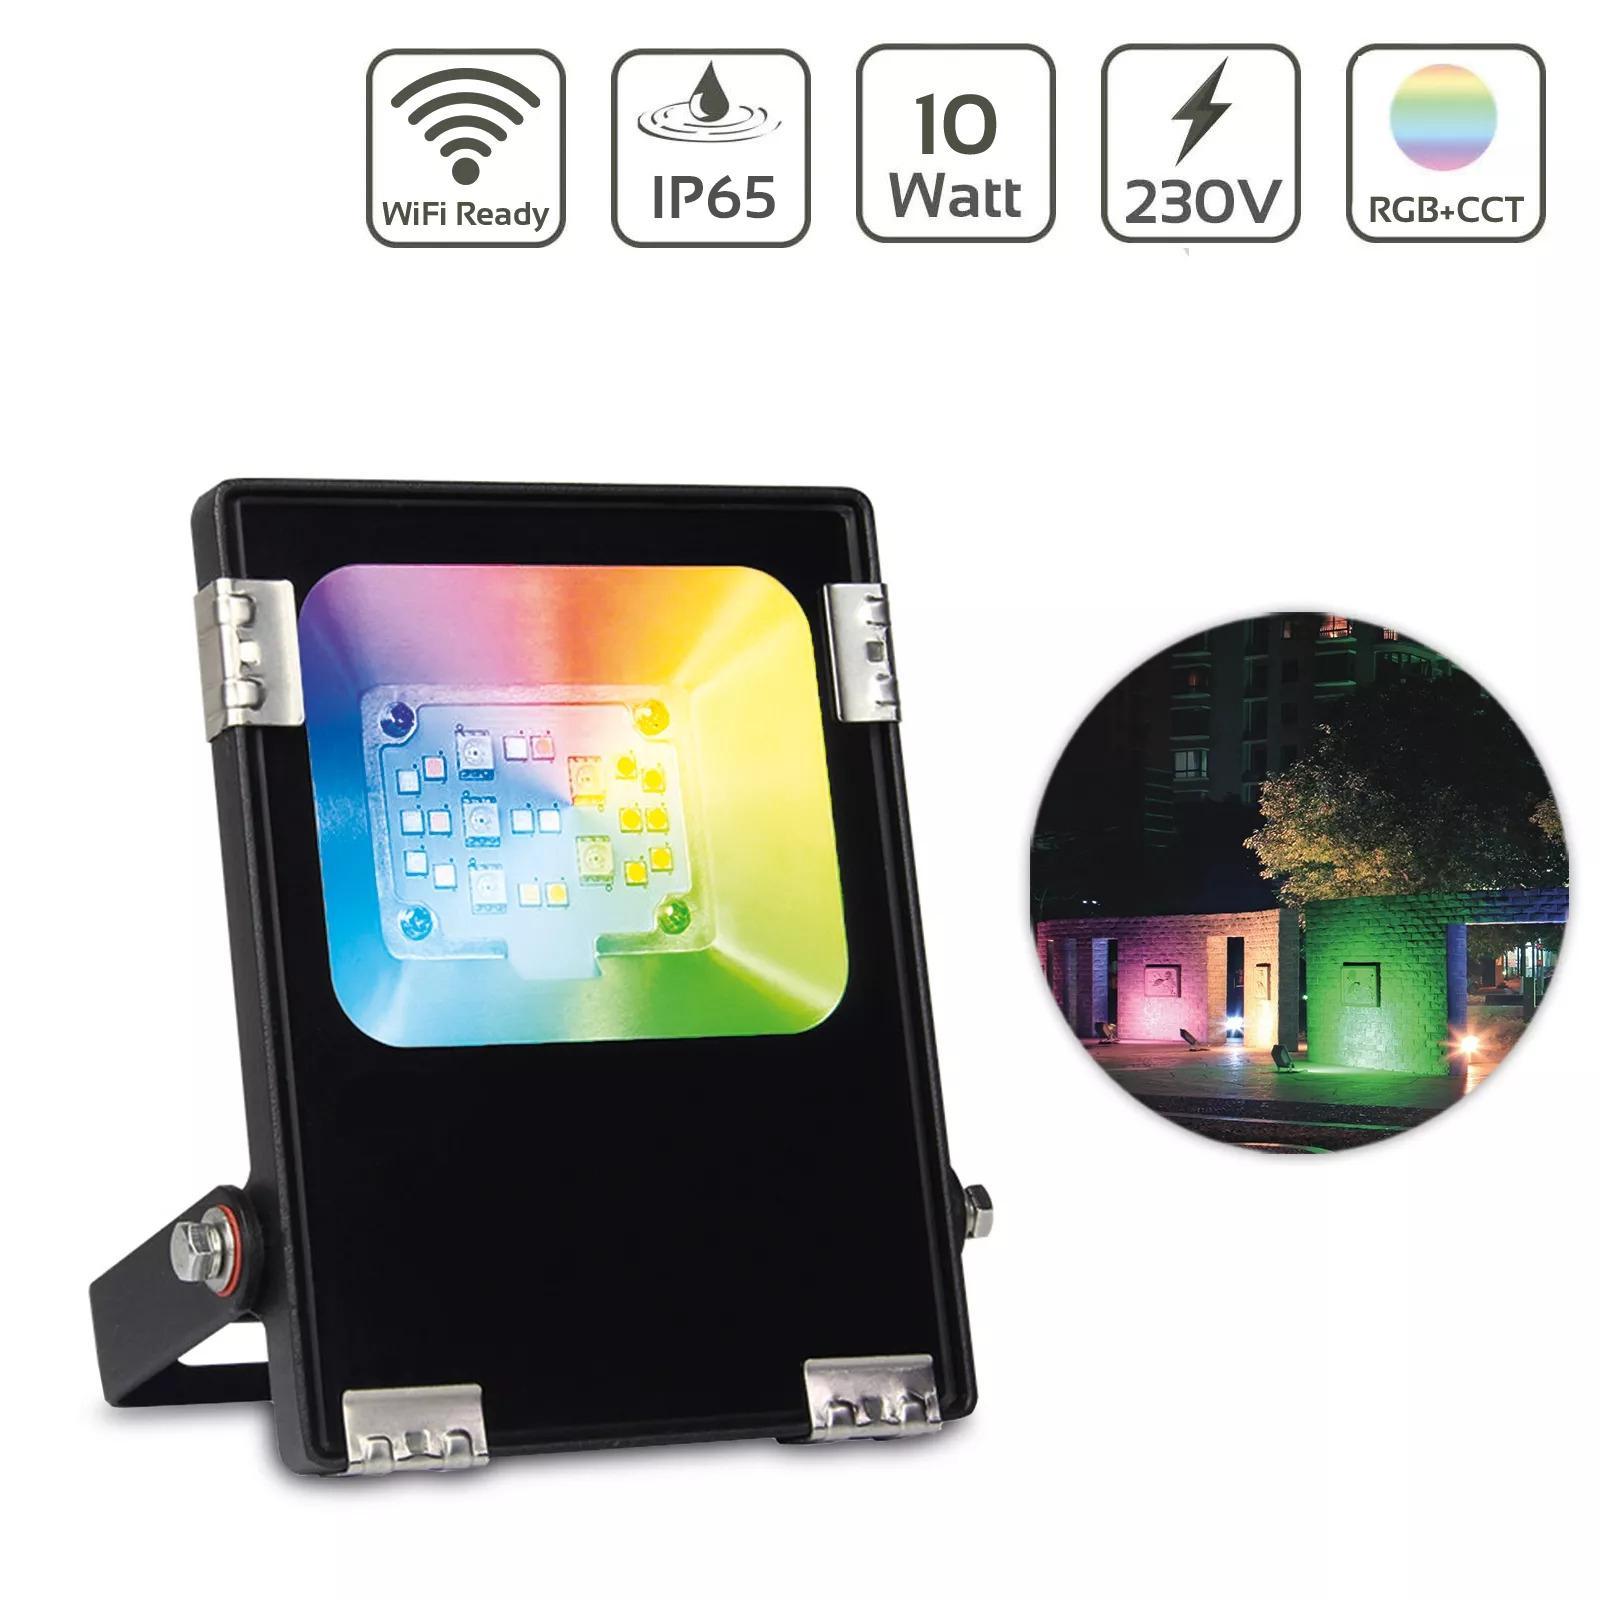 MiBoxer 10W RGB+CCT LED Außenstrahler WiFi Farbwechsel Fluter FUTT05